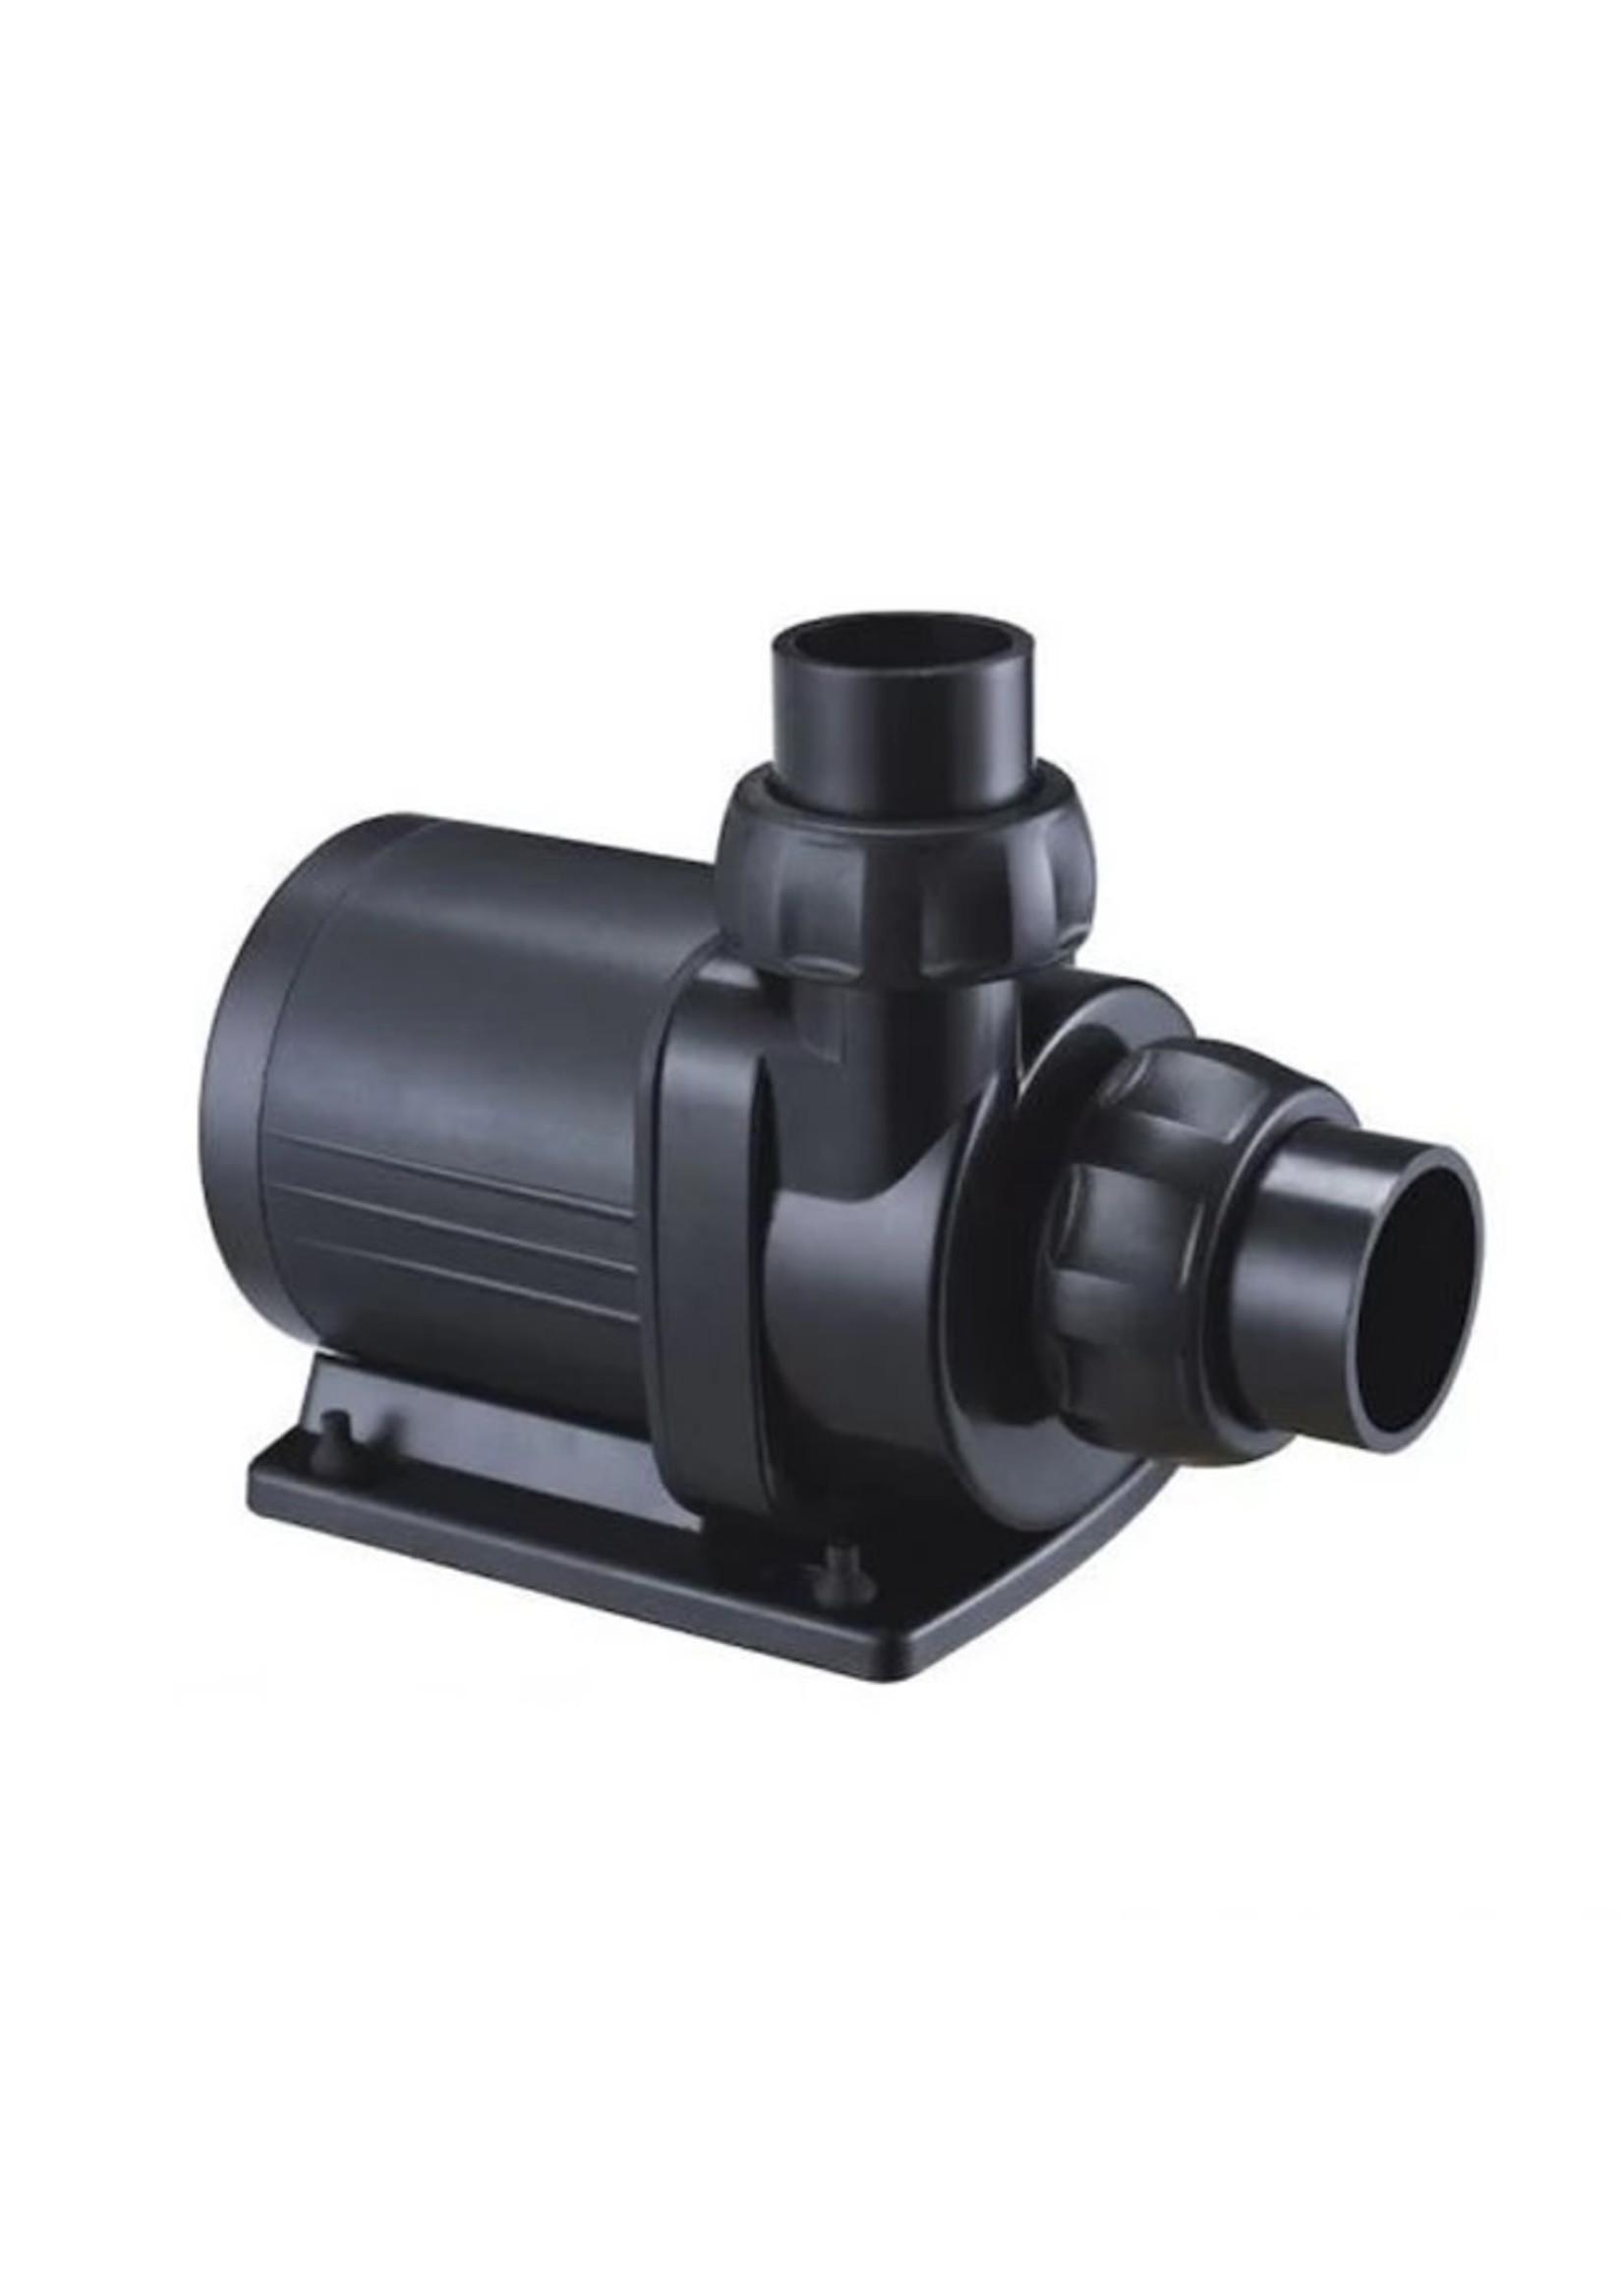 Jebao Jebao DCP Submersible DC Pump